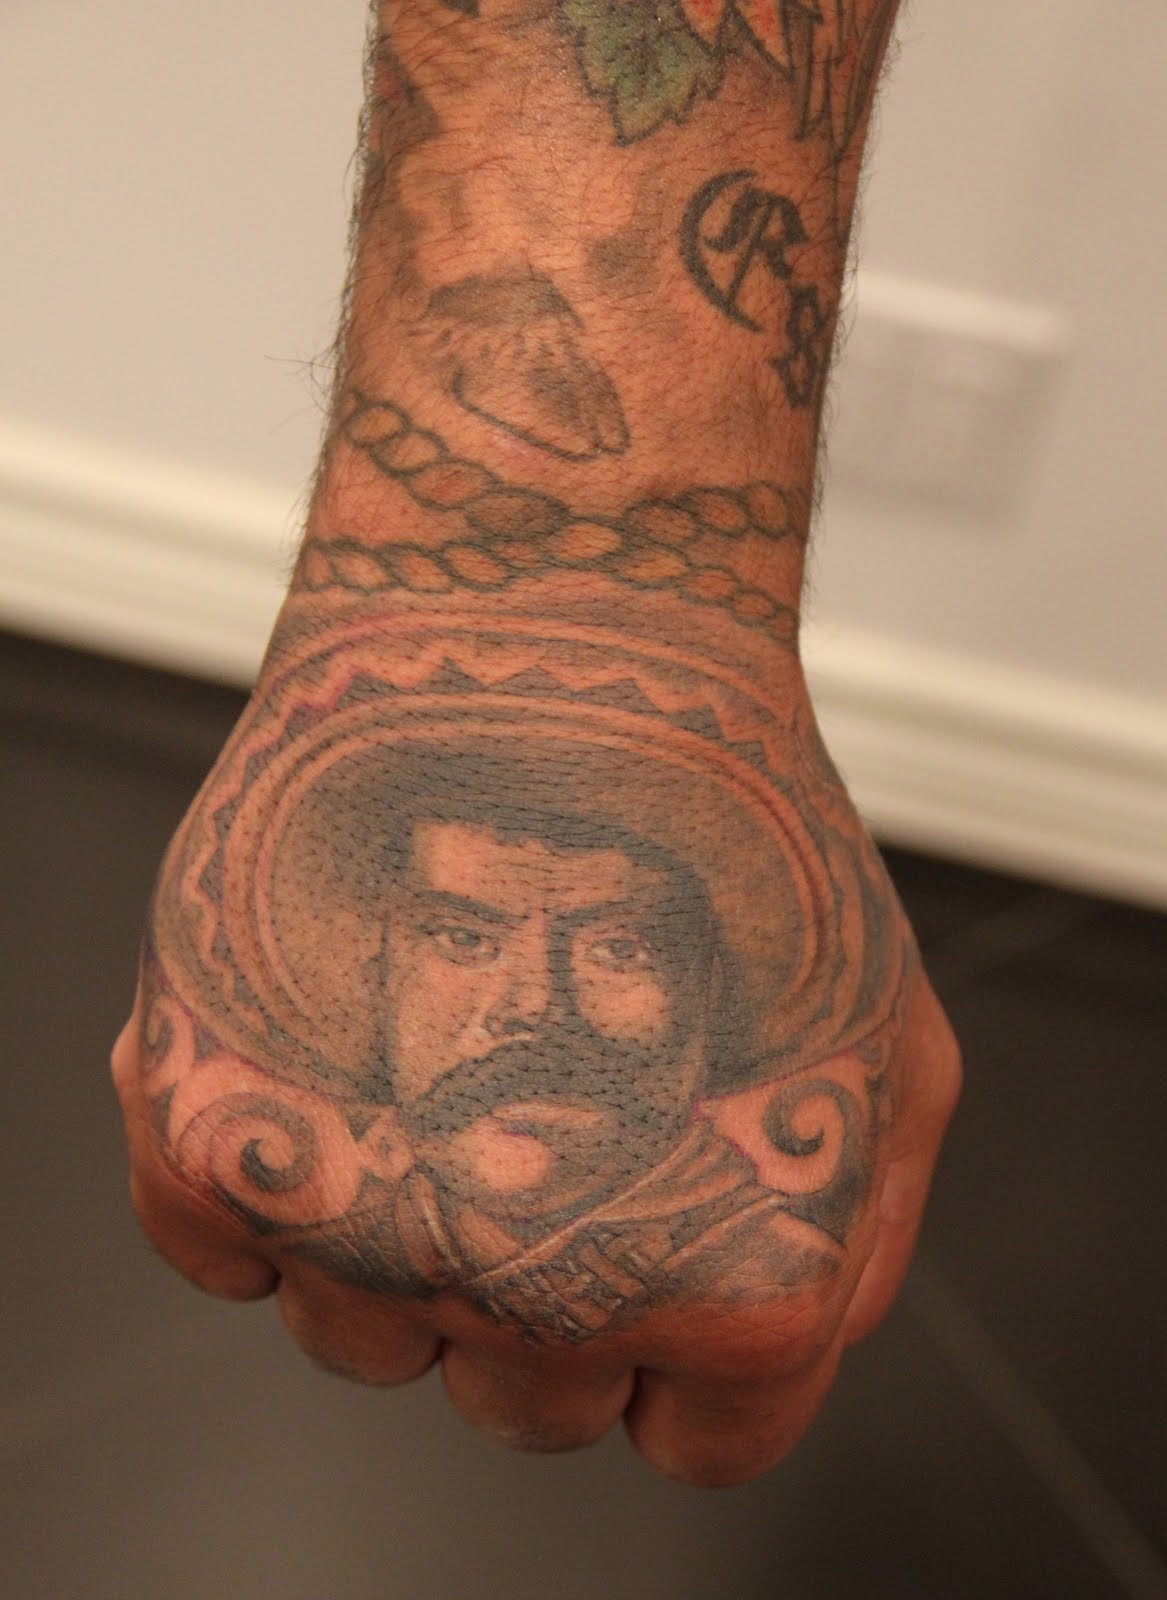 mister cartoon cultura and pride tattoo design idea